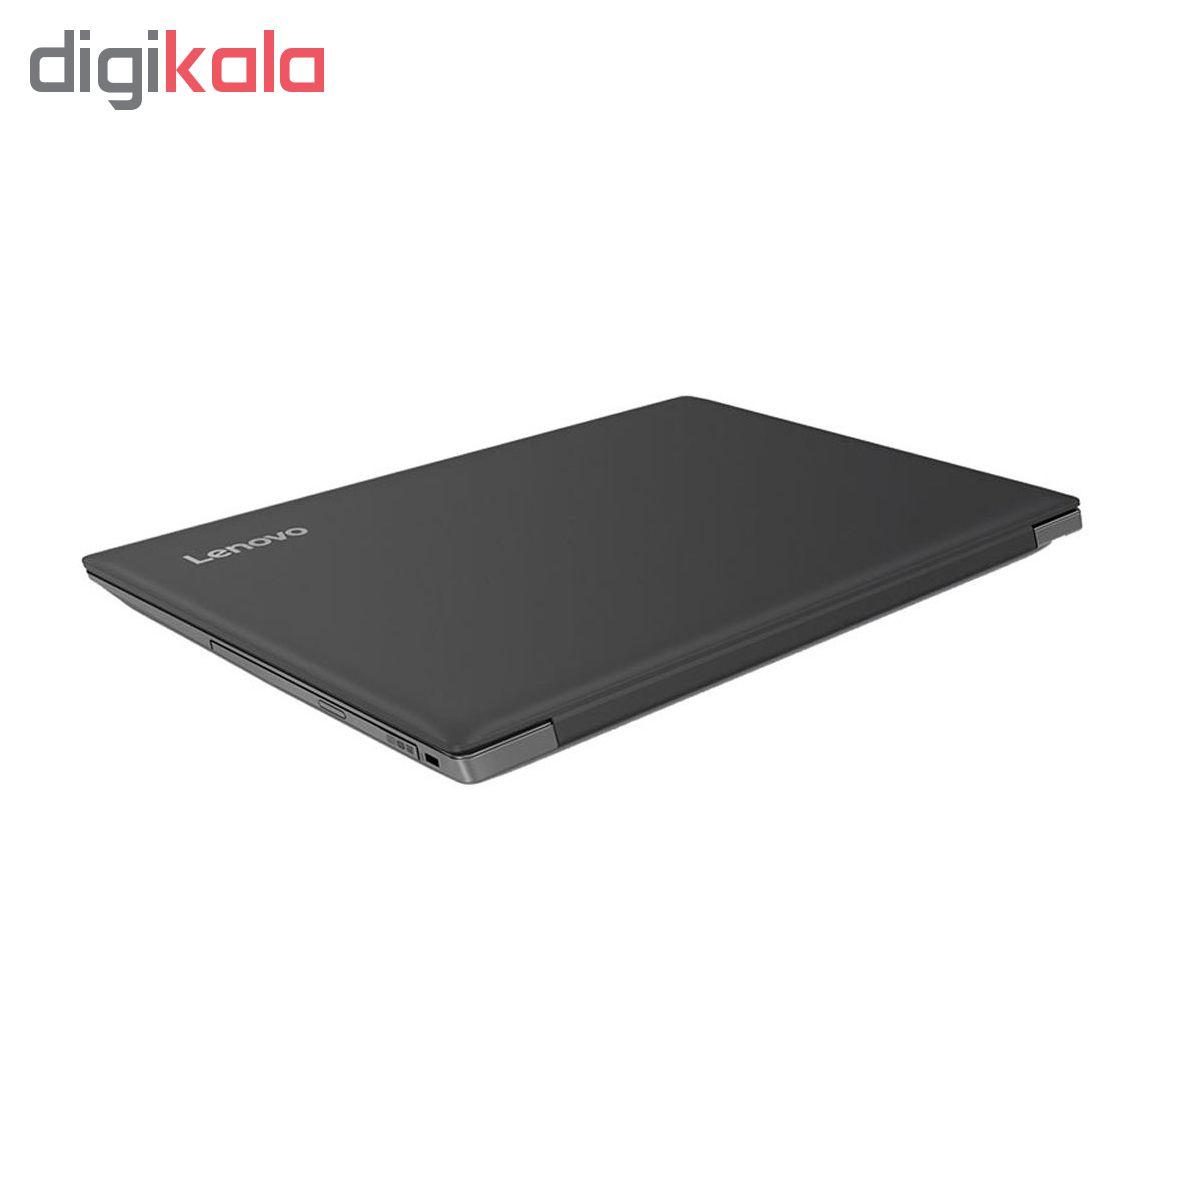 لپ تاپ 15 اینچی لنوو مدل Ideapad 330 - X